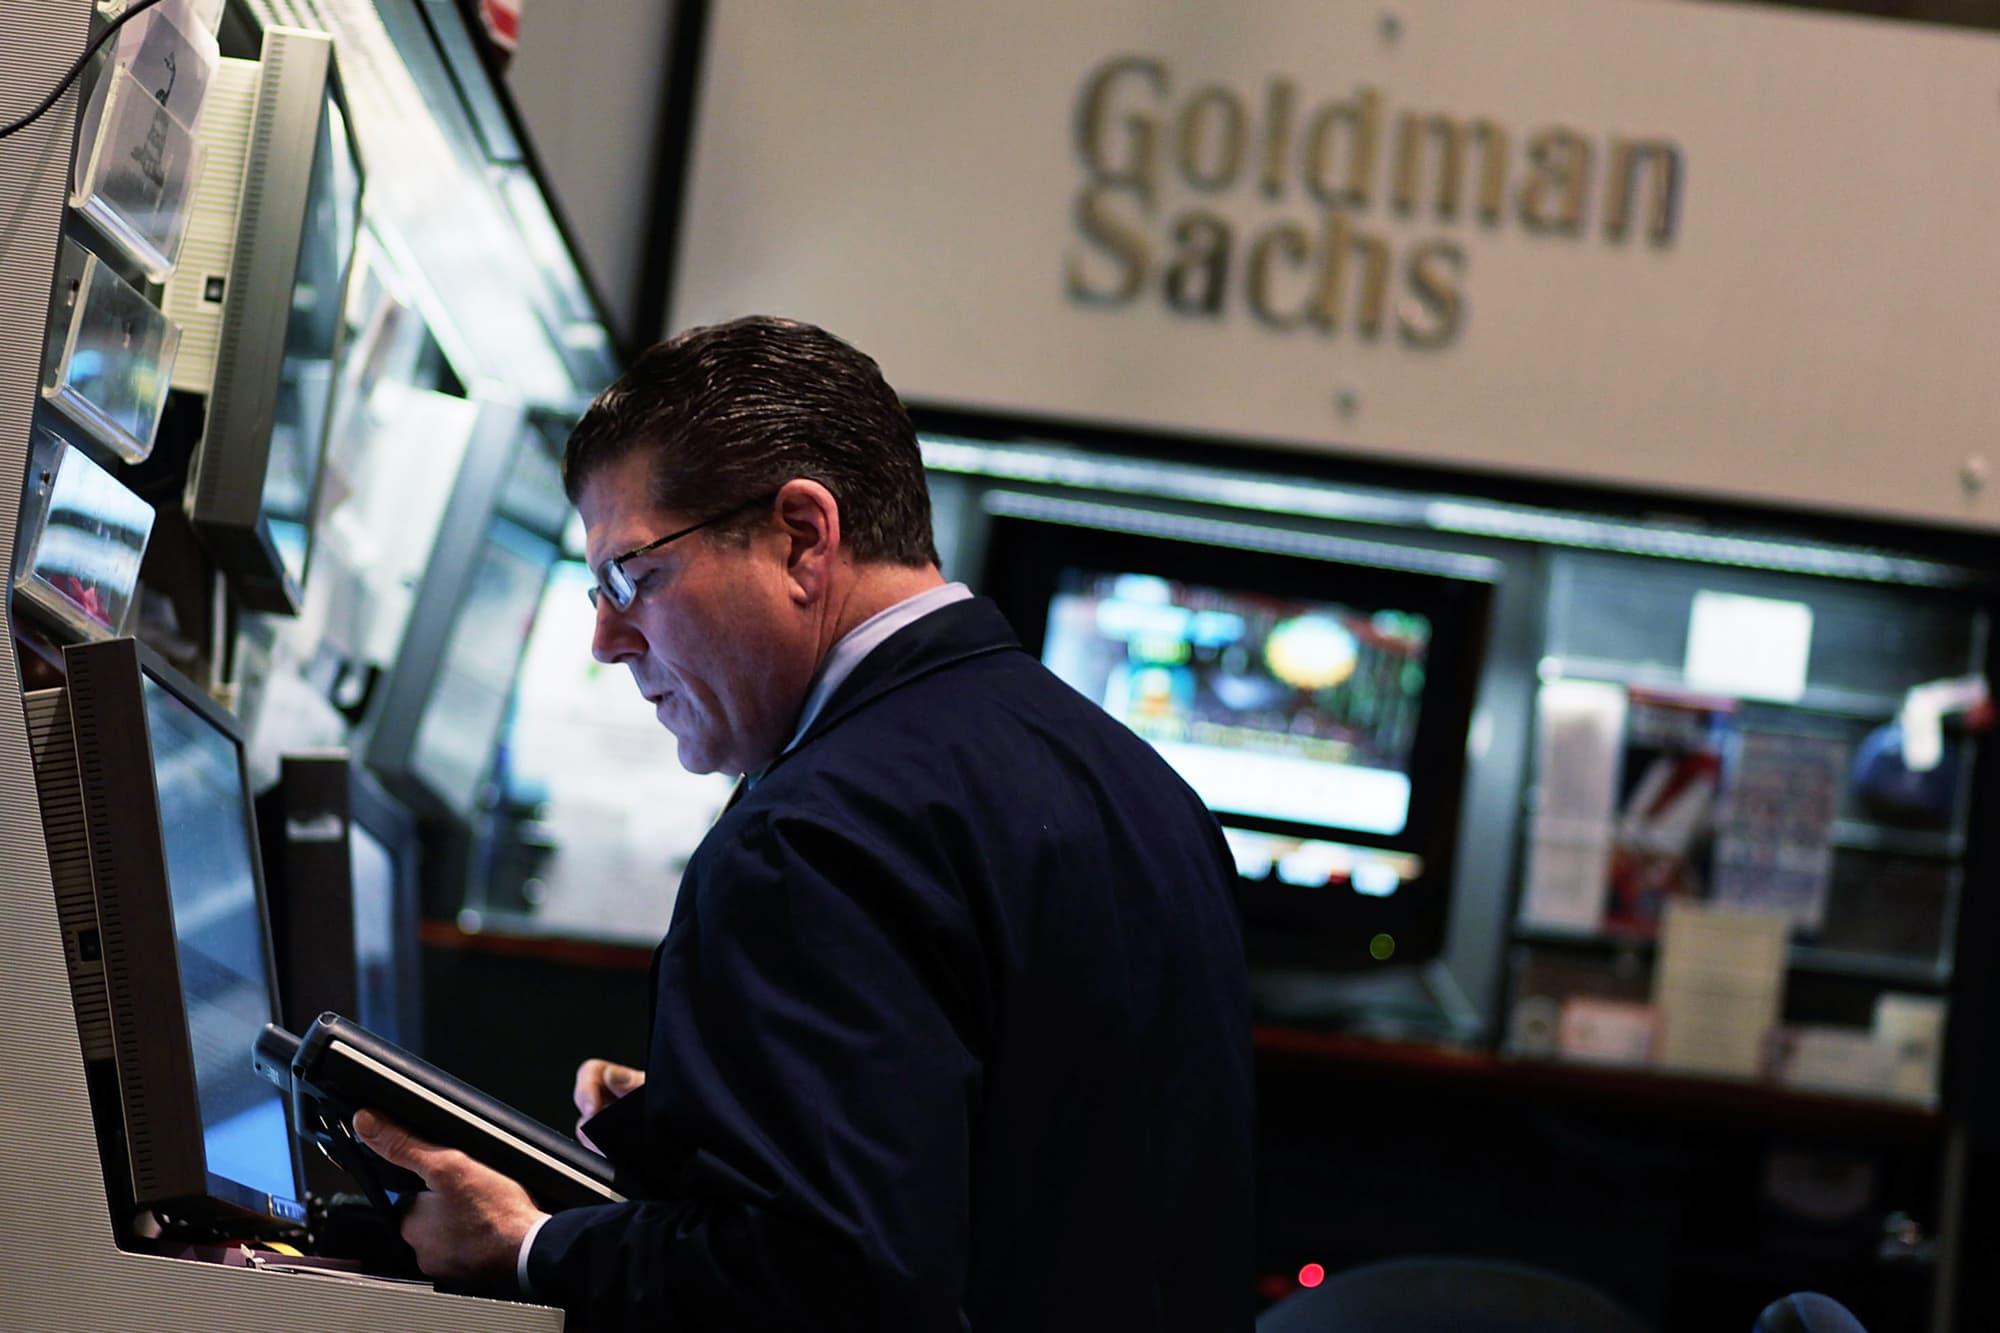 Goldman Sachs shares fall after Bank of America says 1MDB scandal